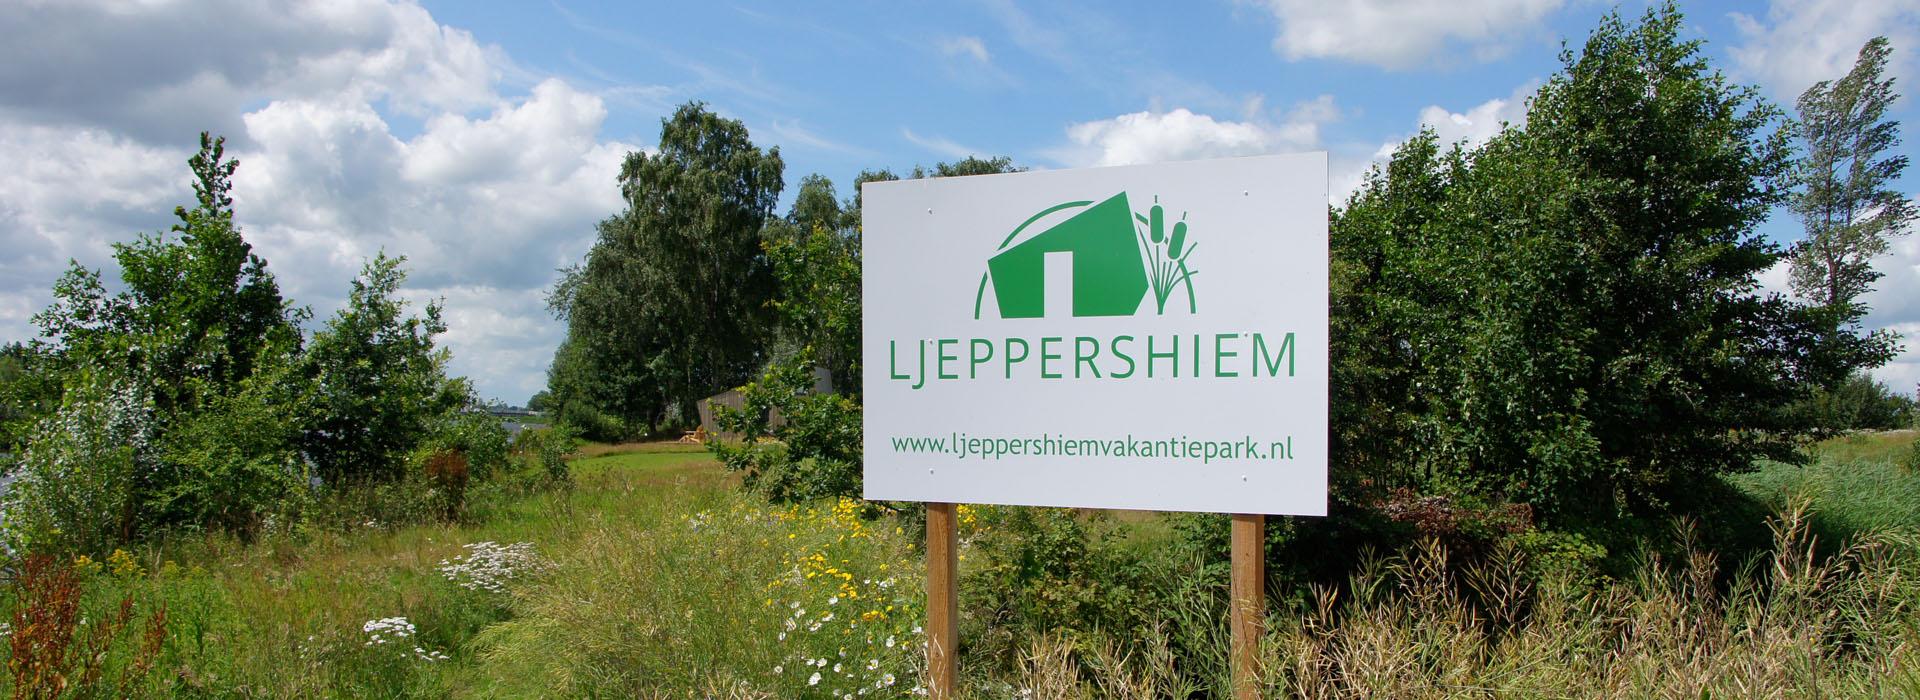 vakantie - friesland - vakantiepark - Ljeppershiem - tiny house-natuur2